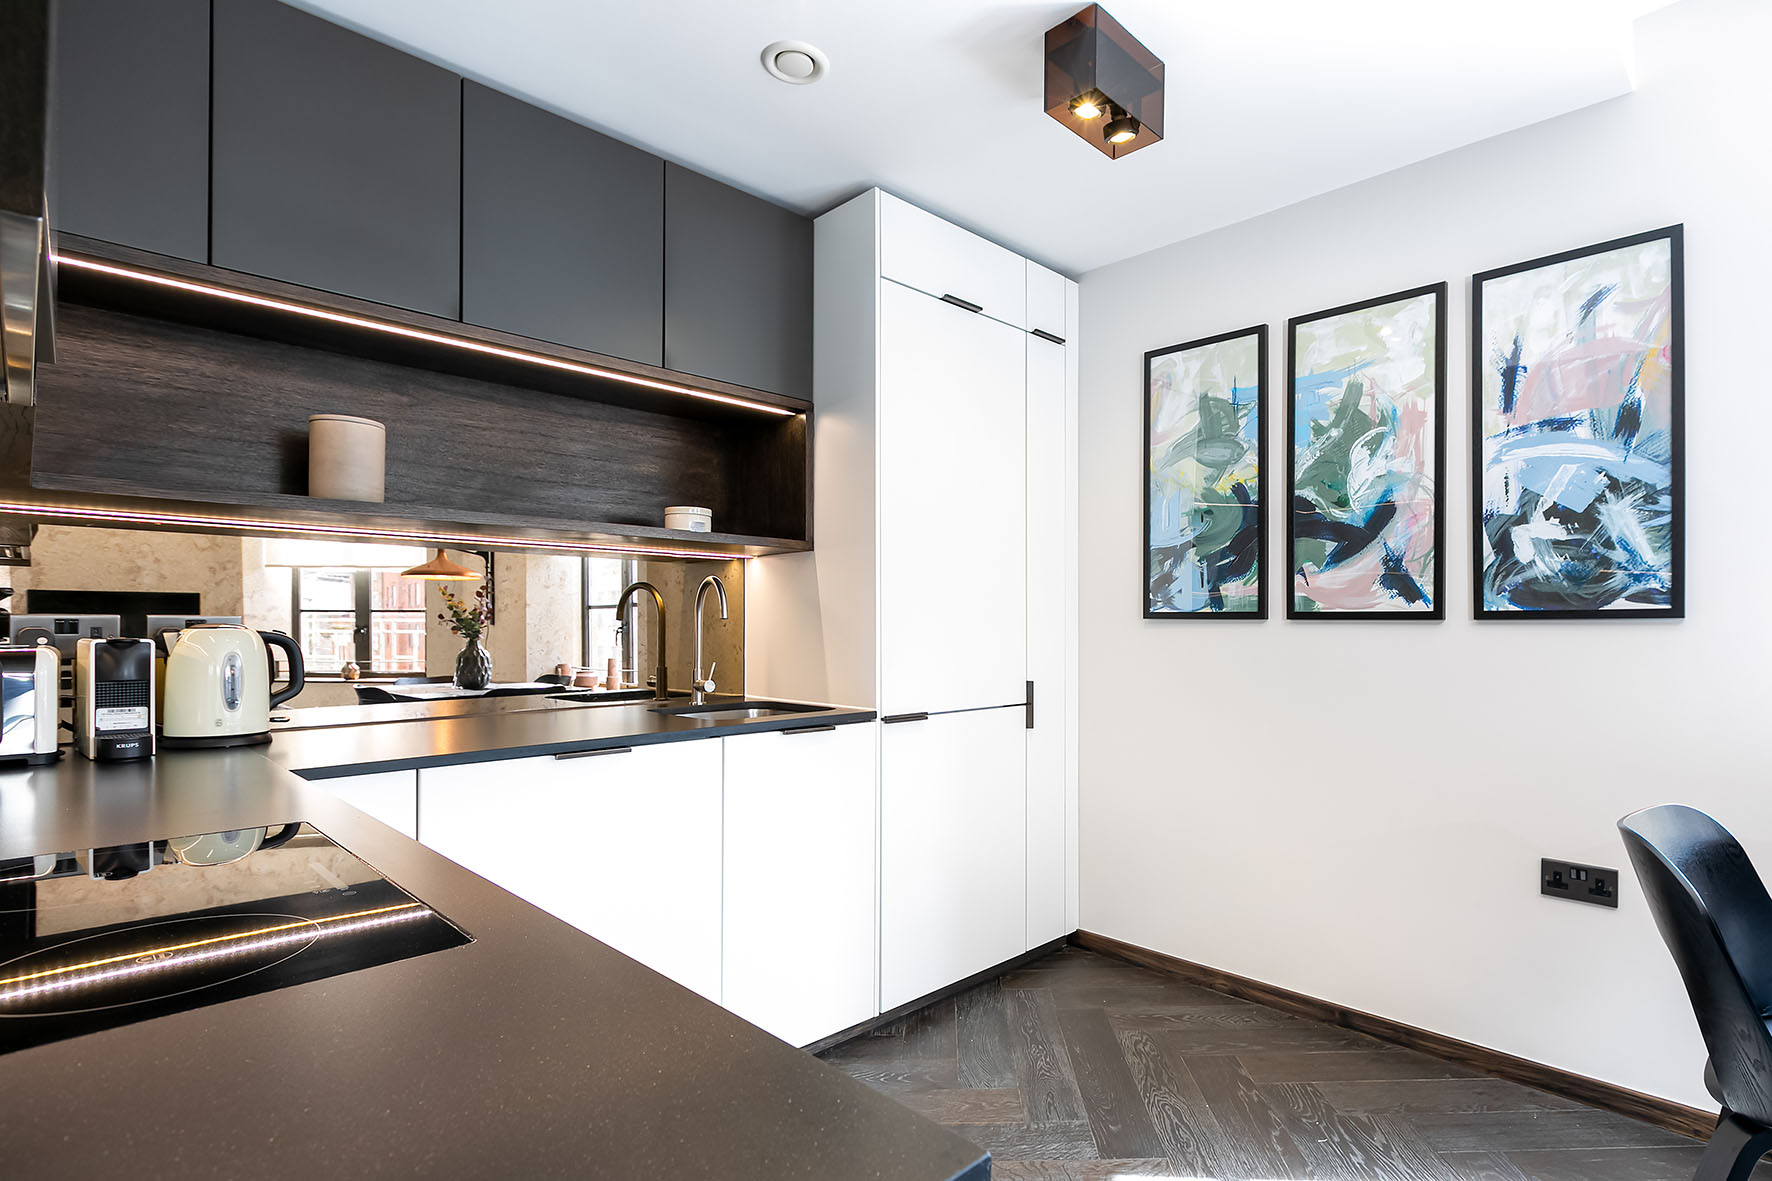 Lovelydays luxury service apartment rental - London - Soho - Noel Street VI - Lovelysuite - 2 bedrooms - 2 bathrooms - Luxury kitchen - a271a3863904 - Lovelydays